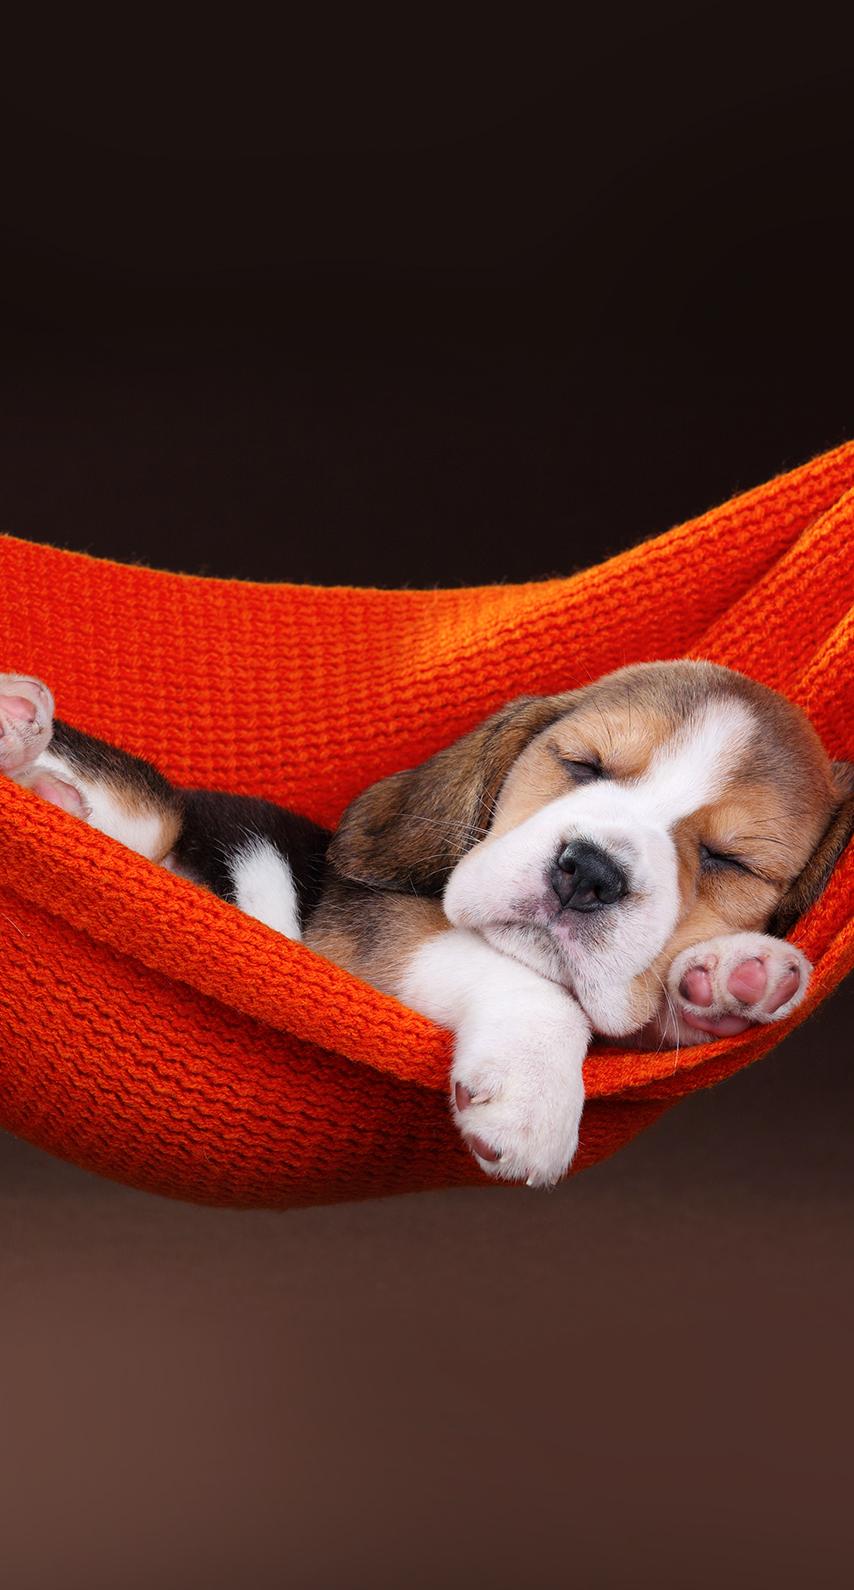 puppy, sleep